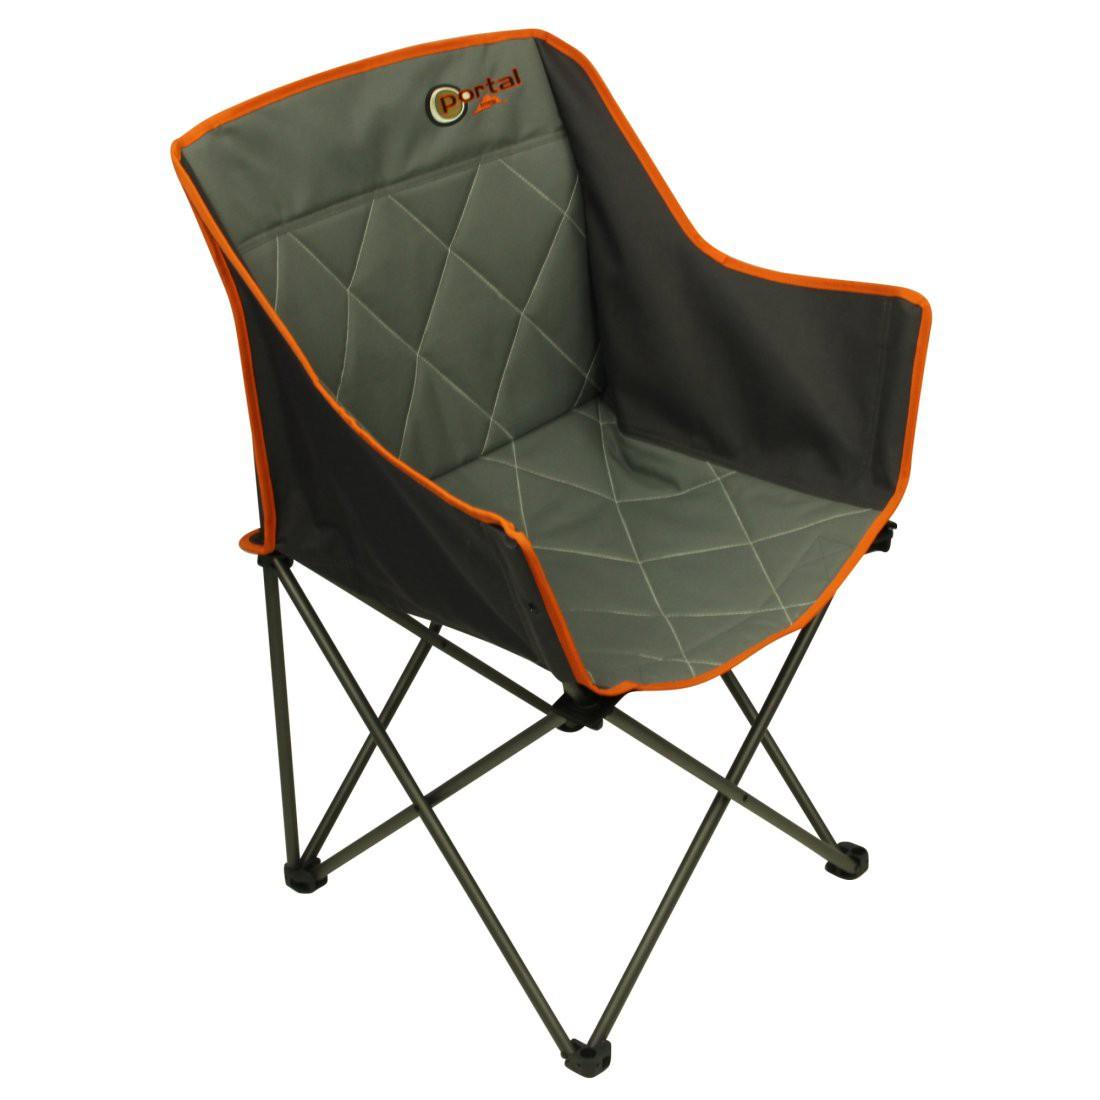 Portal tom chaise de camping 44x45x44 87 cm 2 9kg for Chaise 87 cm